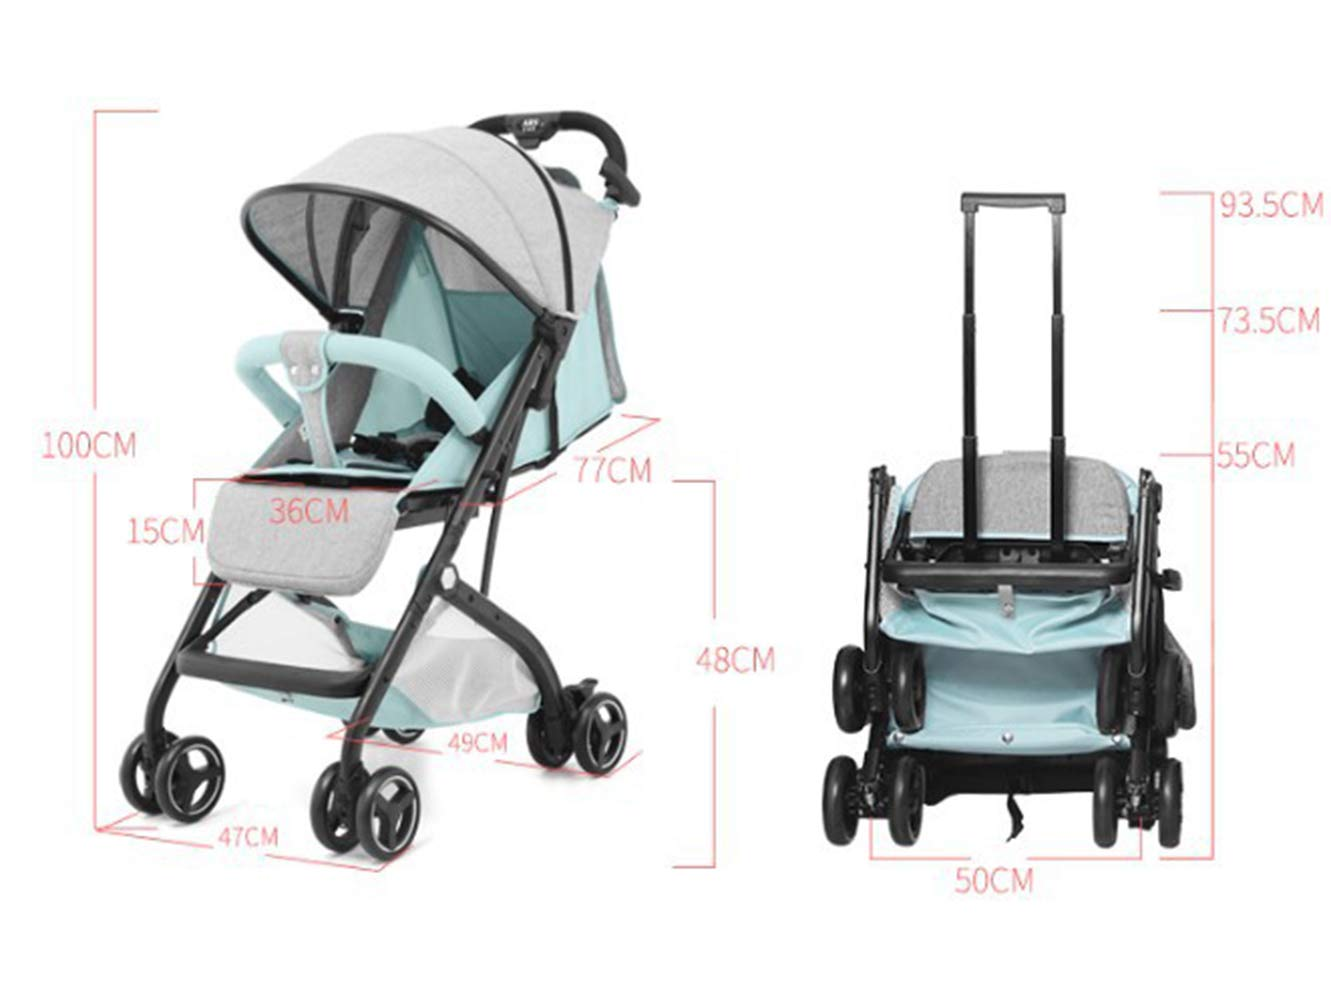 Amazon.com: SHOWGG Cochecito de bebé, recién nacido, ligero ...